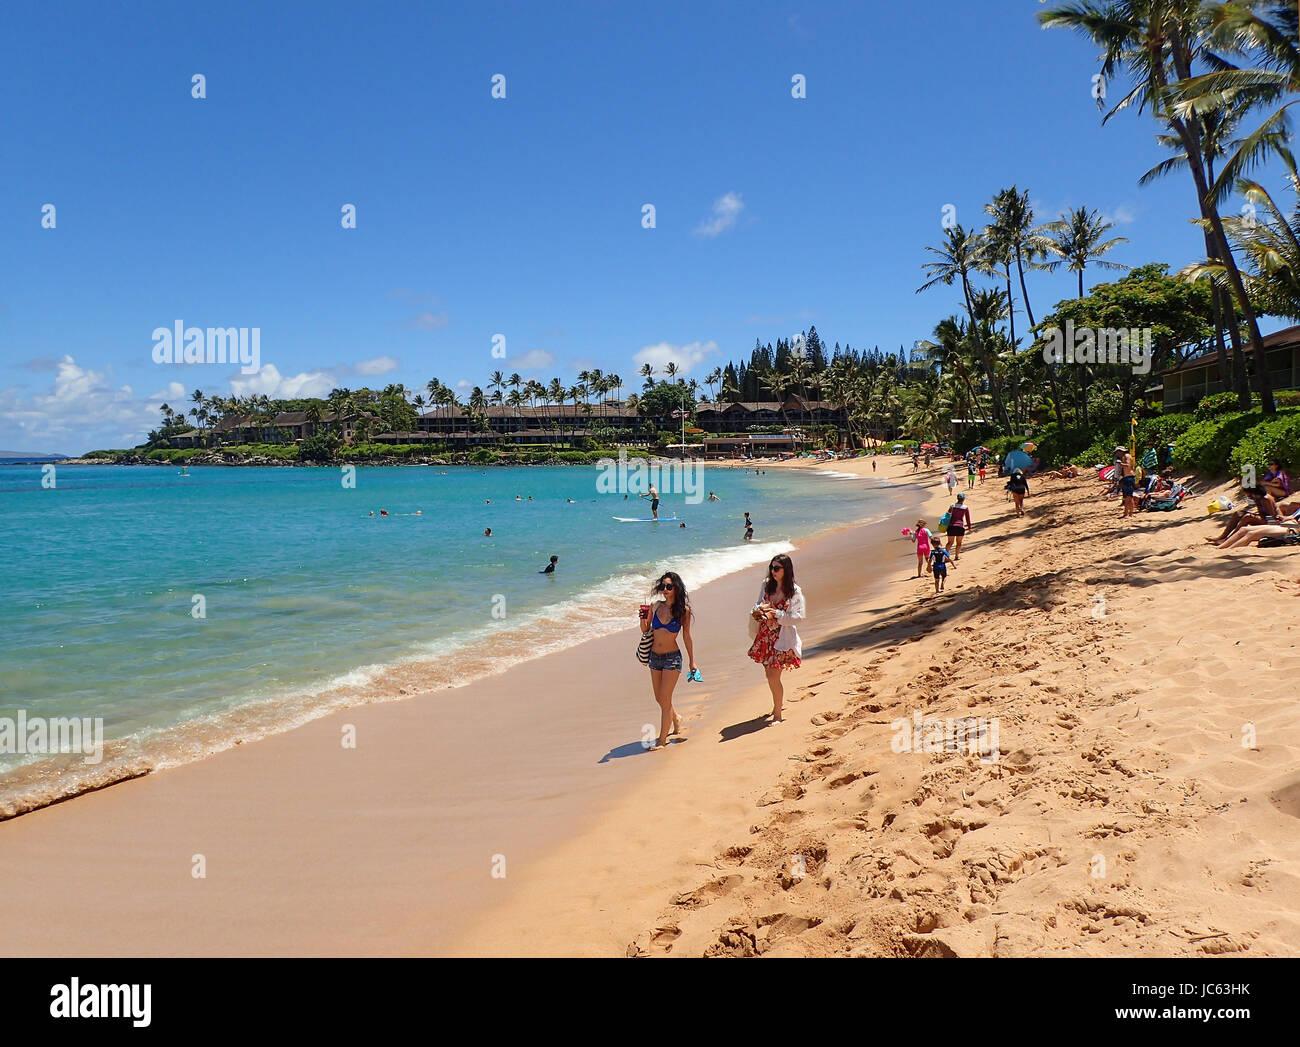 Napili bay beach, Maui, Hawaii. - Stock Image